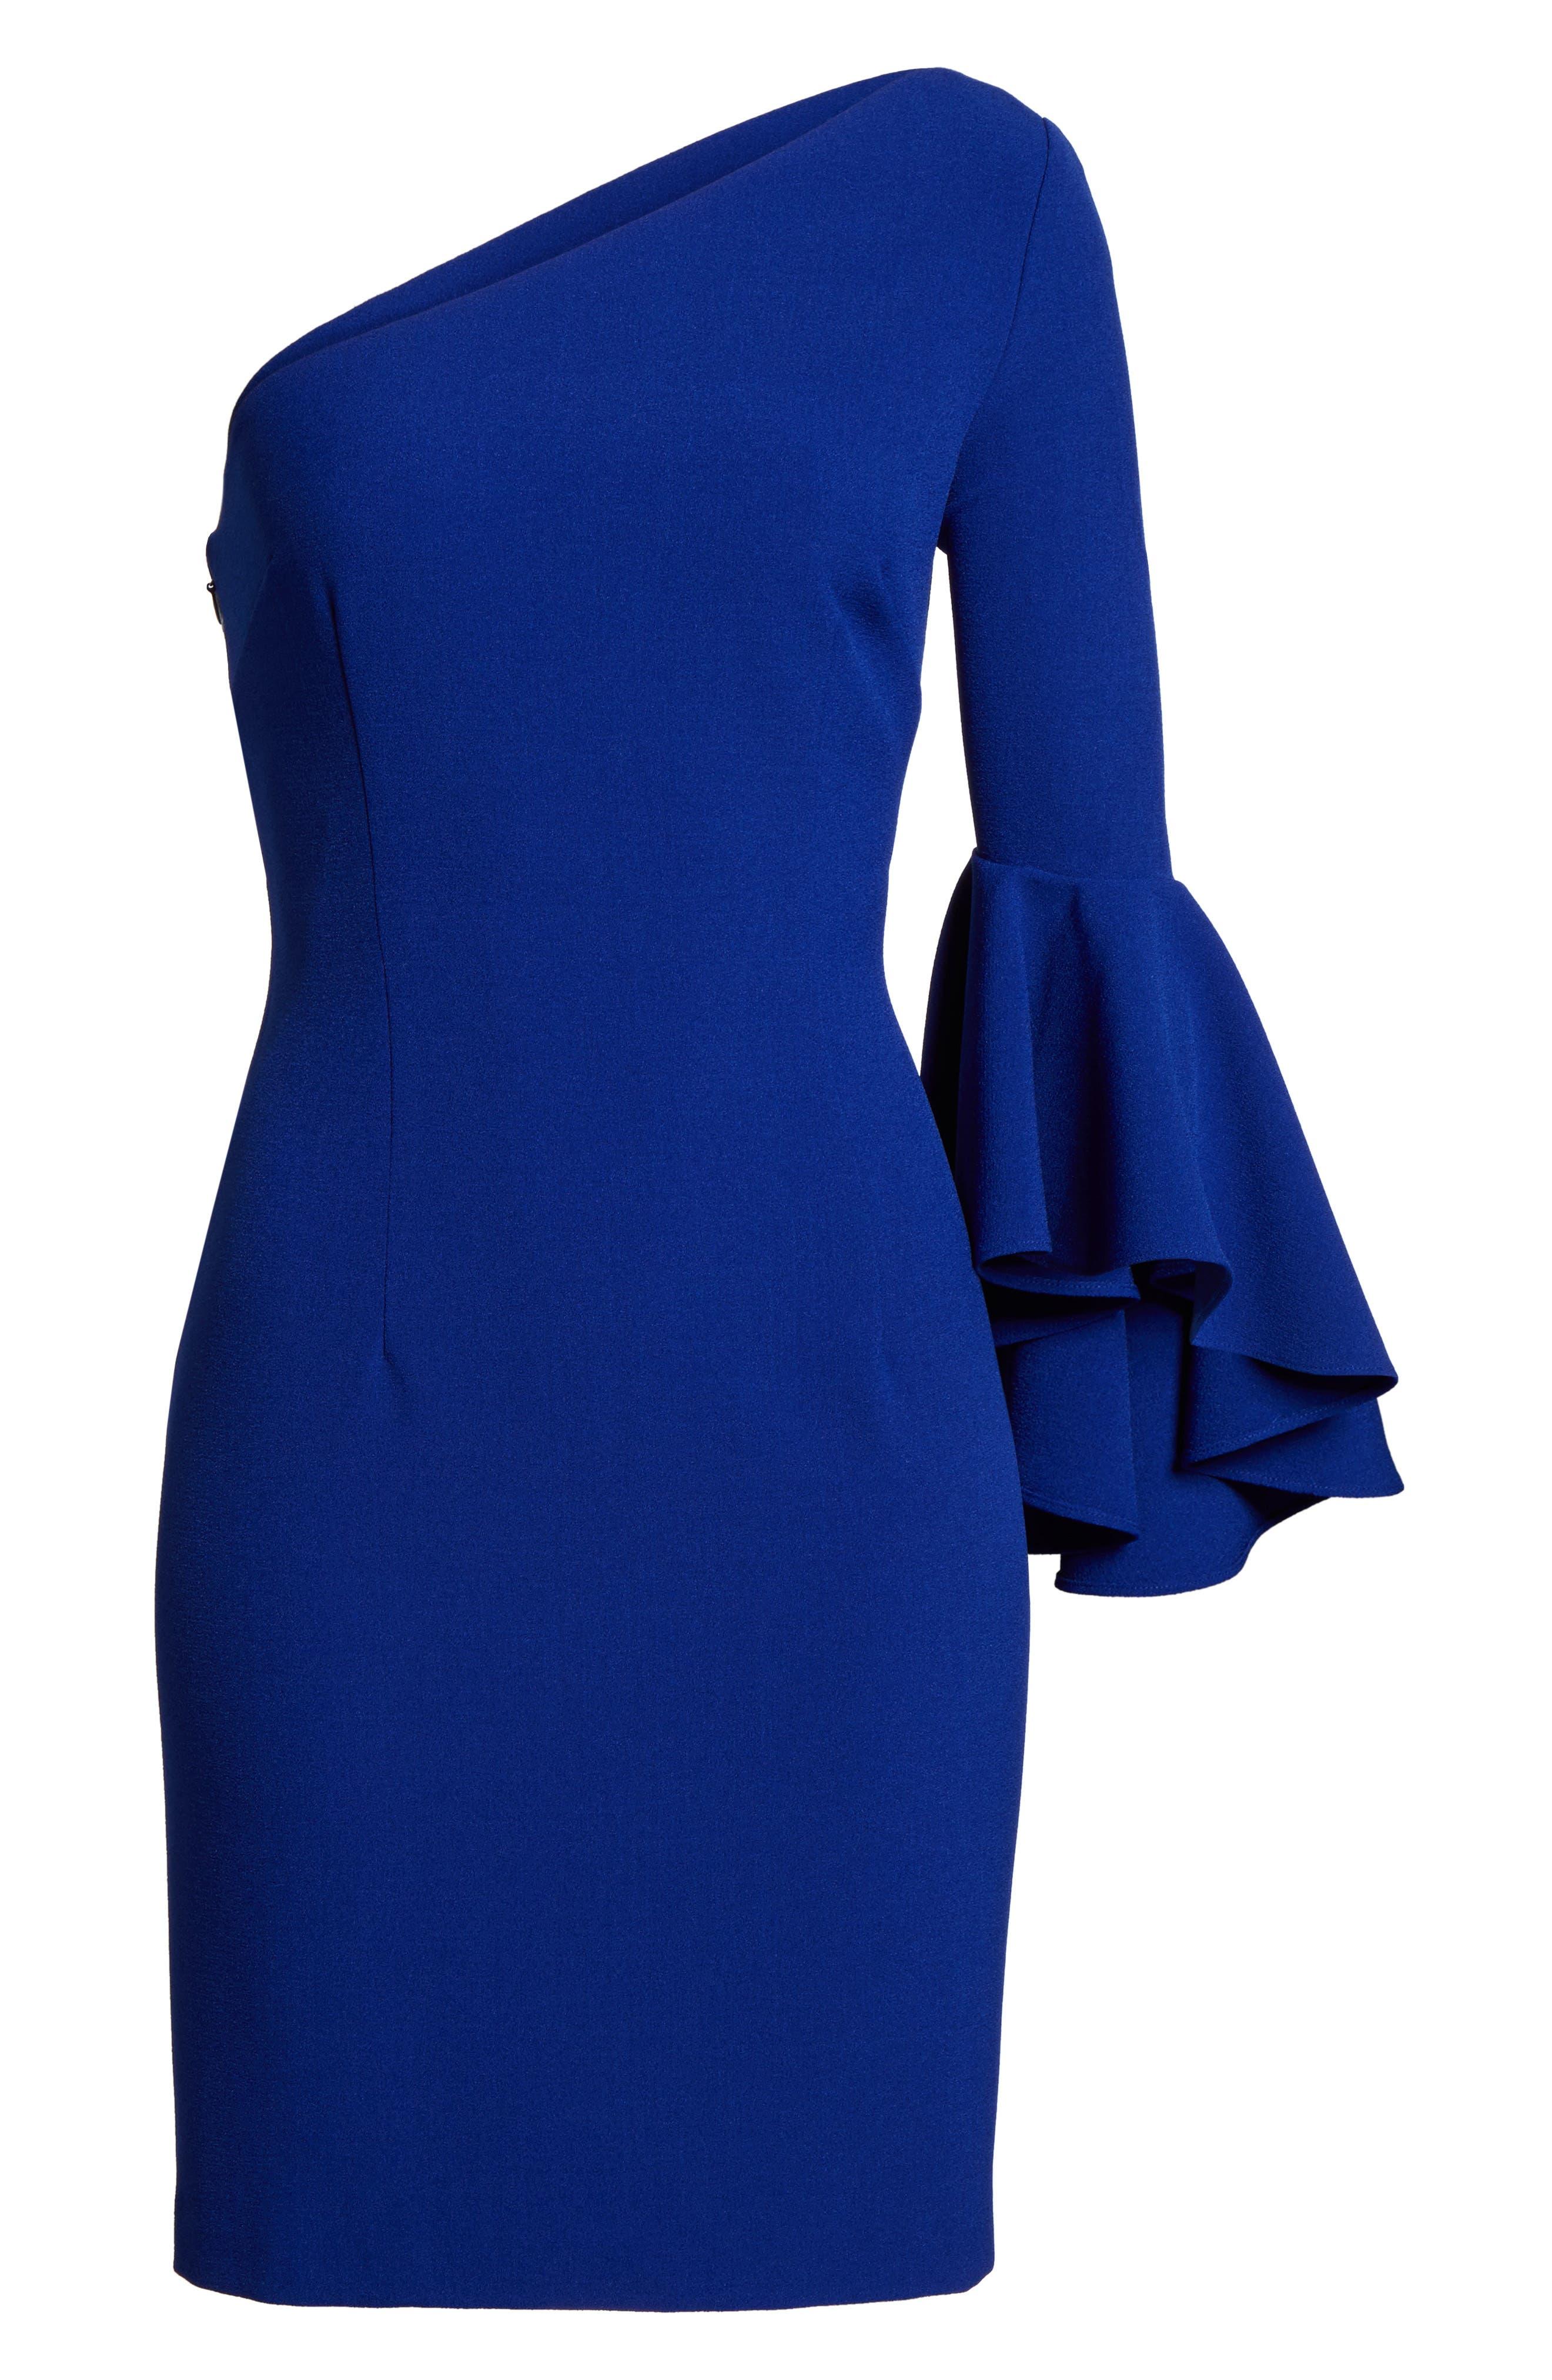 One-Shoulder Crepe Sheath Dress,                             Alternate thumbnail 6, color,                             Blue Cobalt